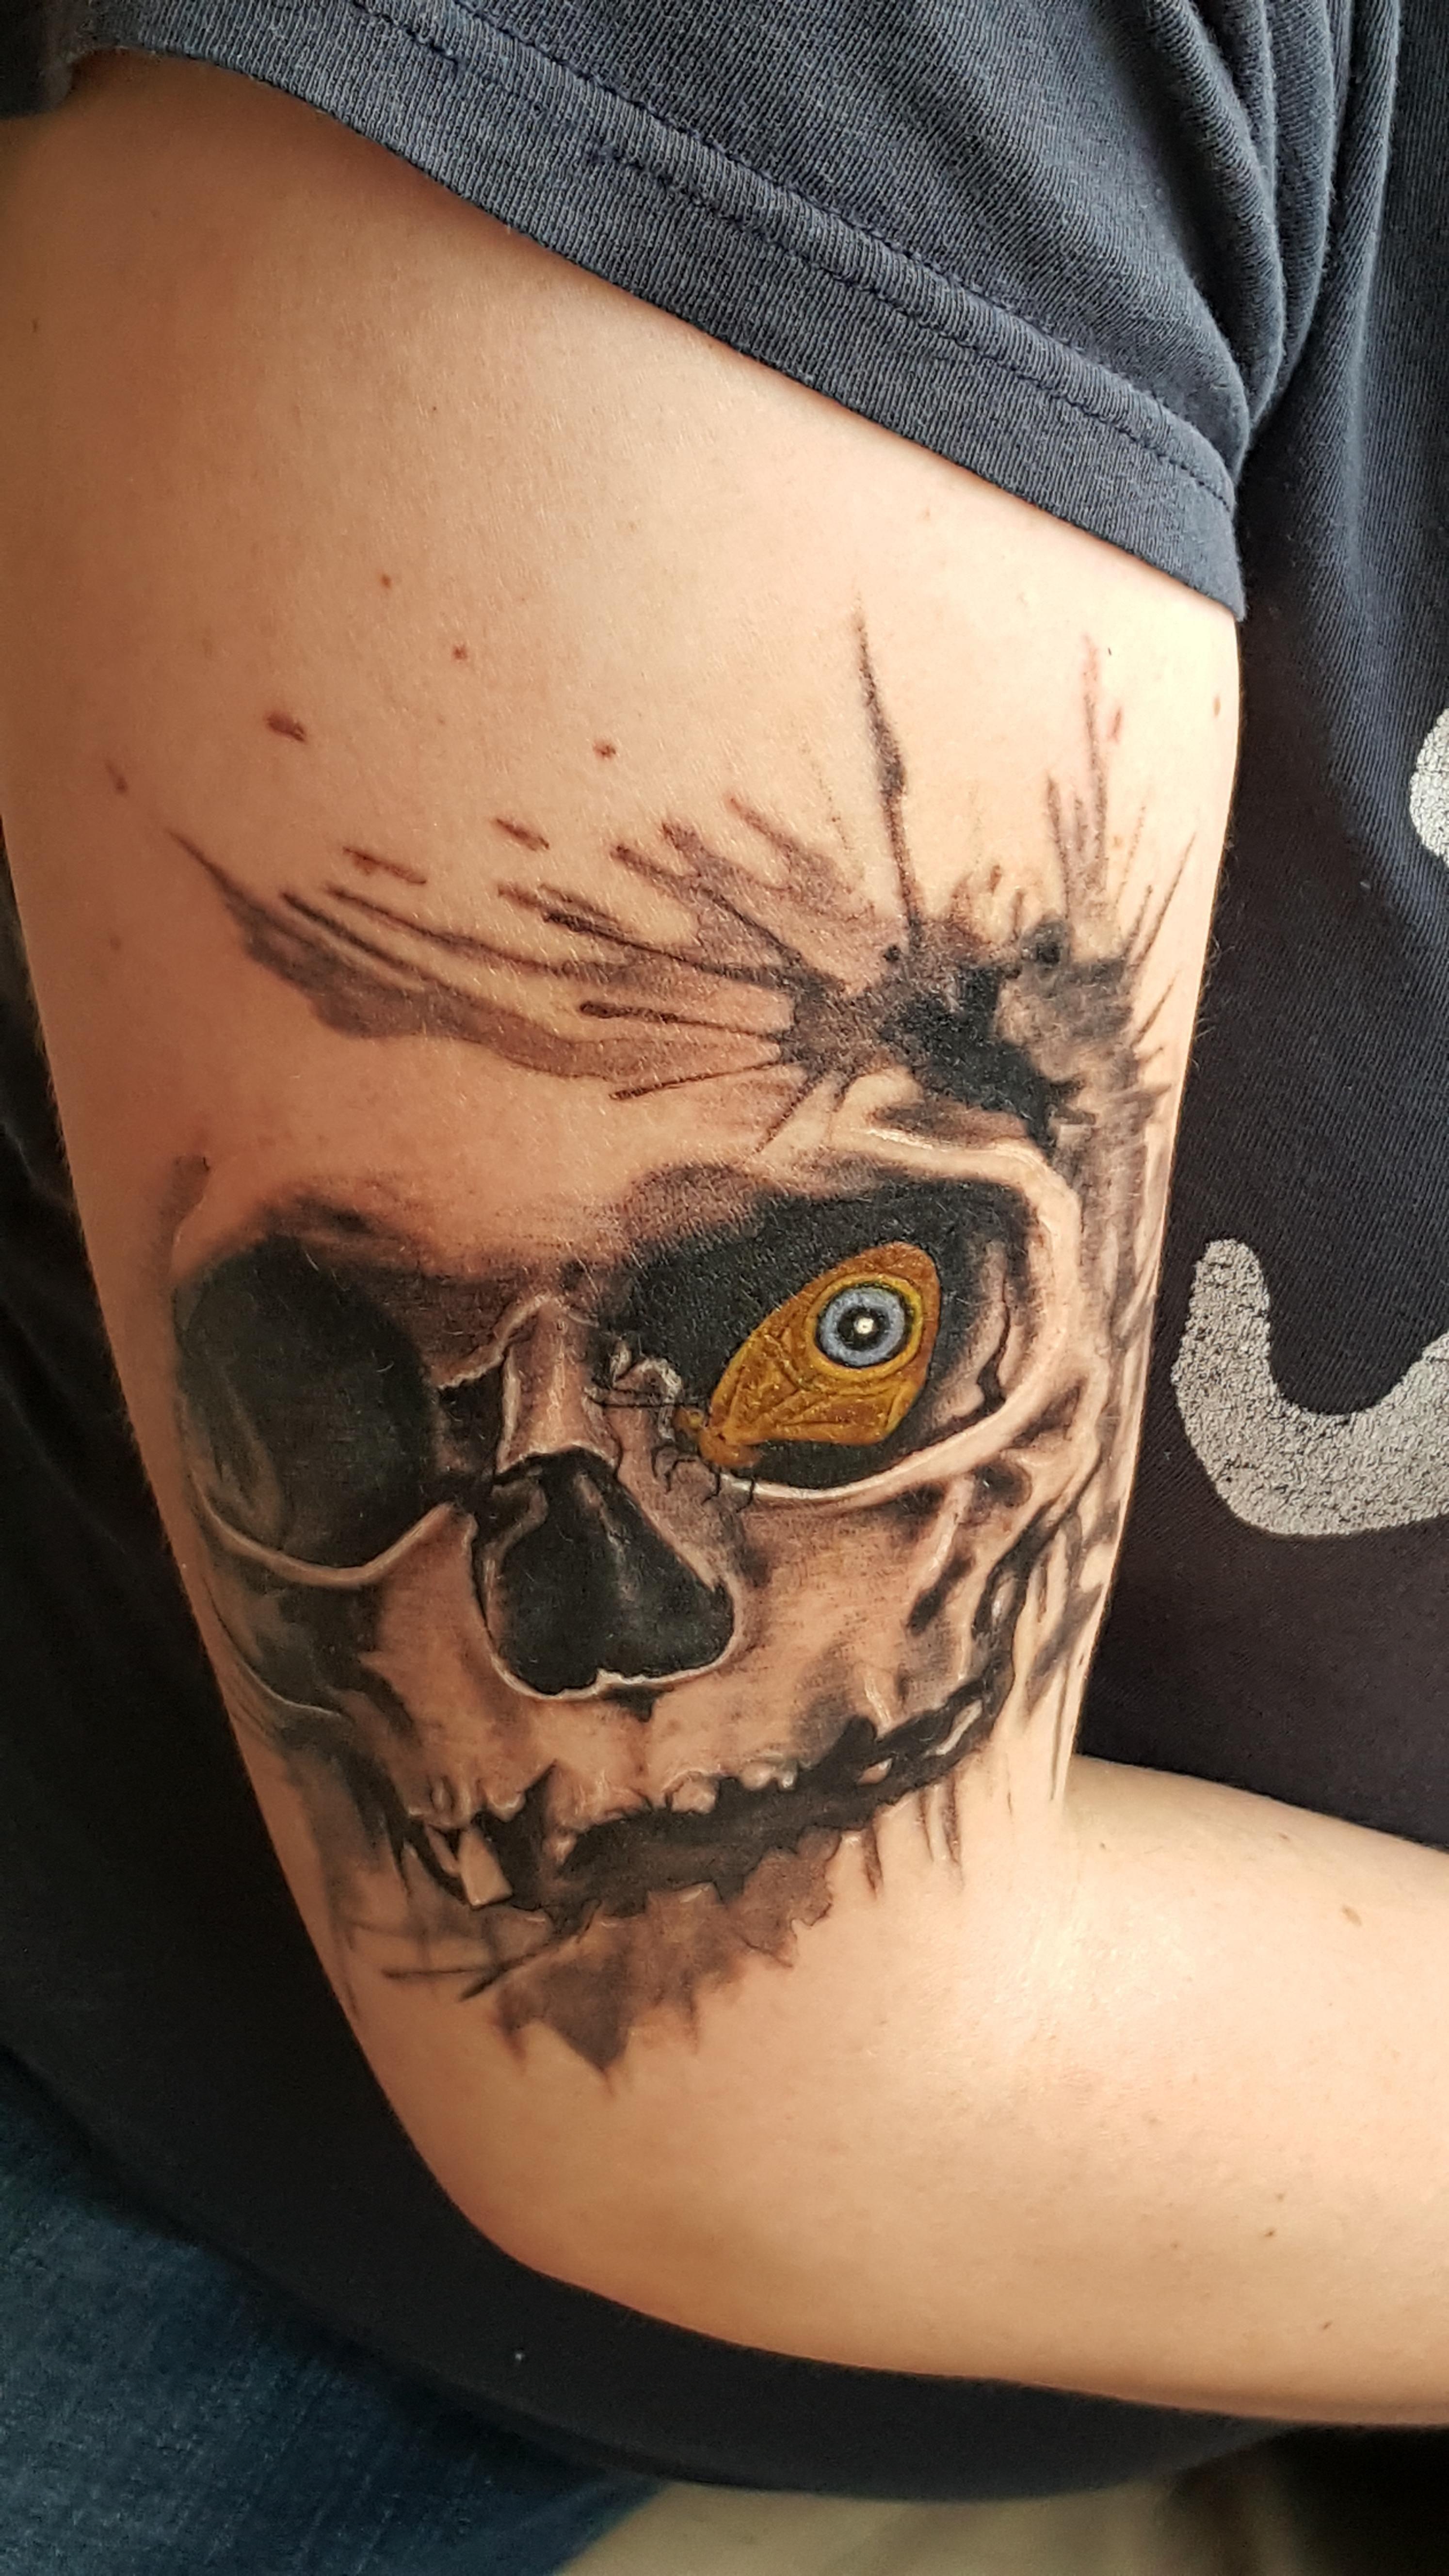 best tattoo artist in tampa reddit